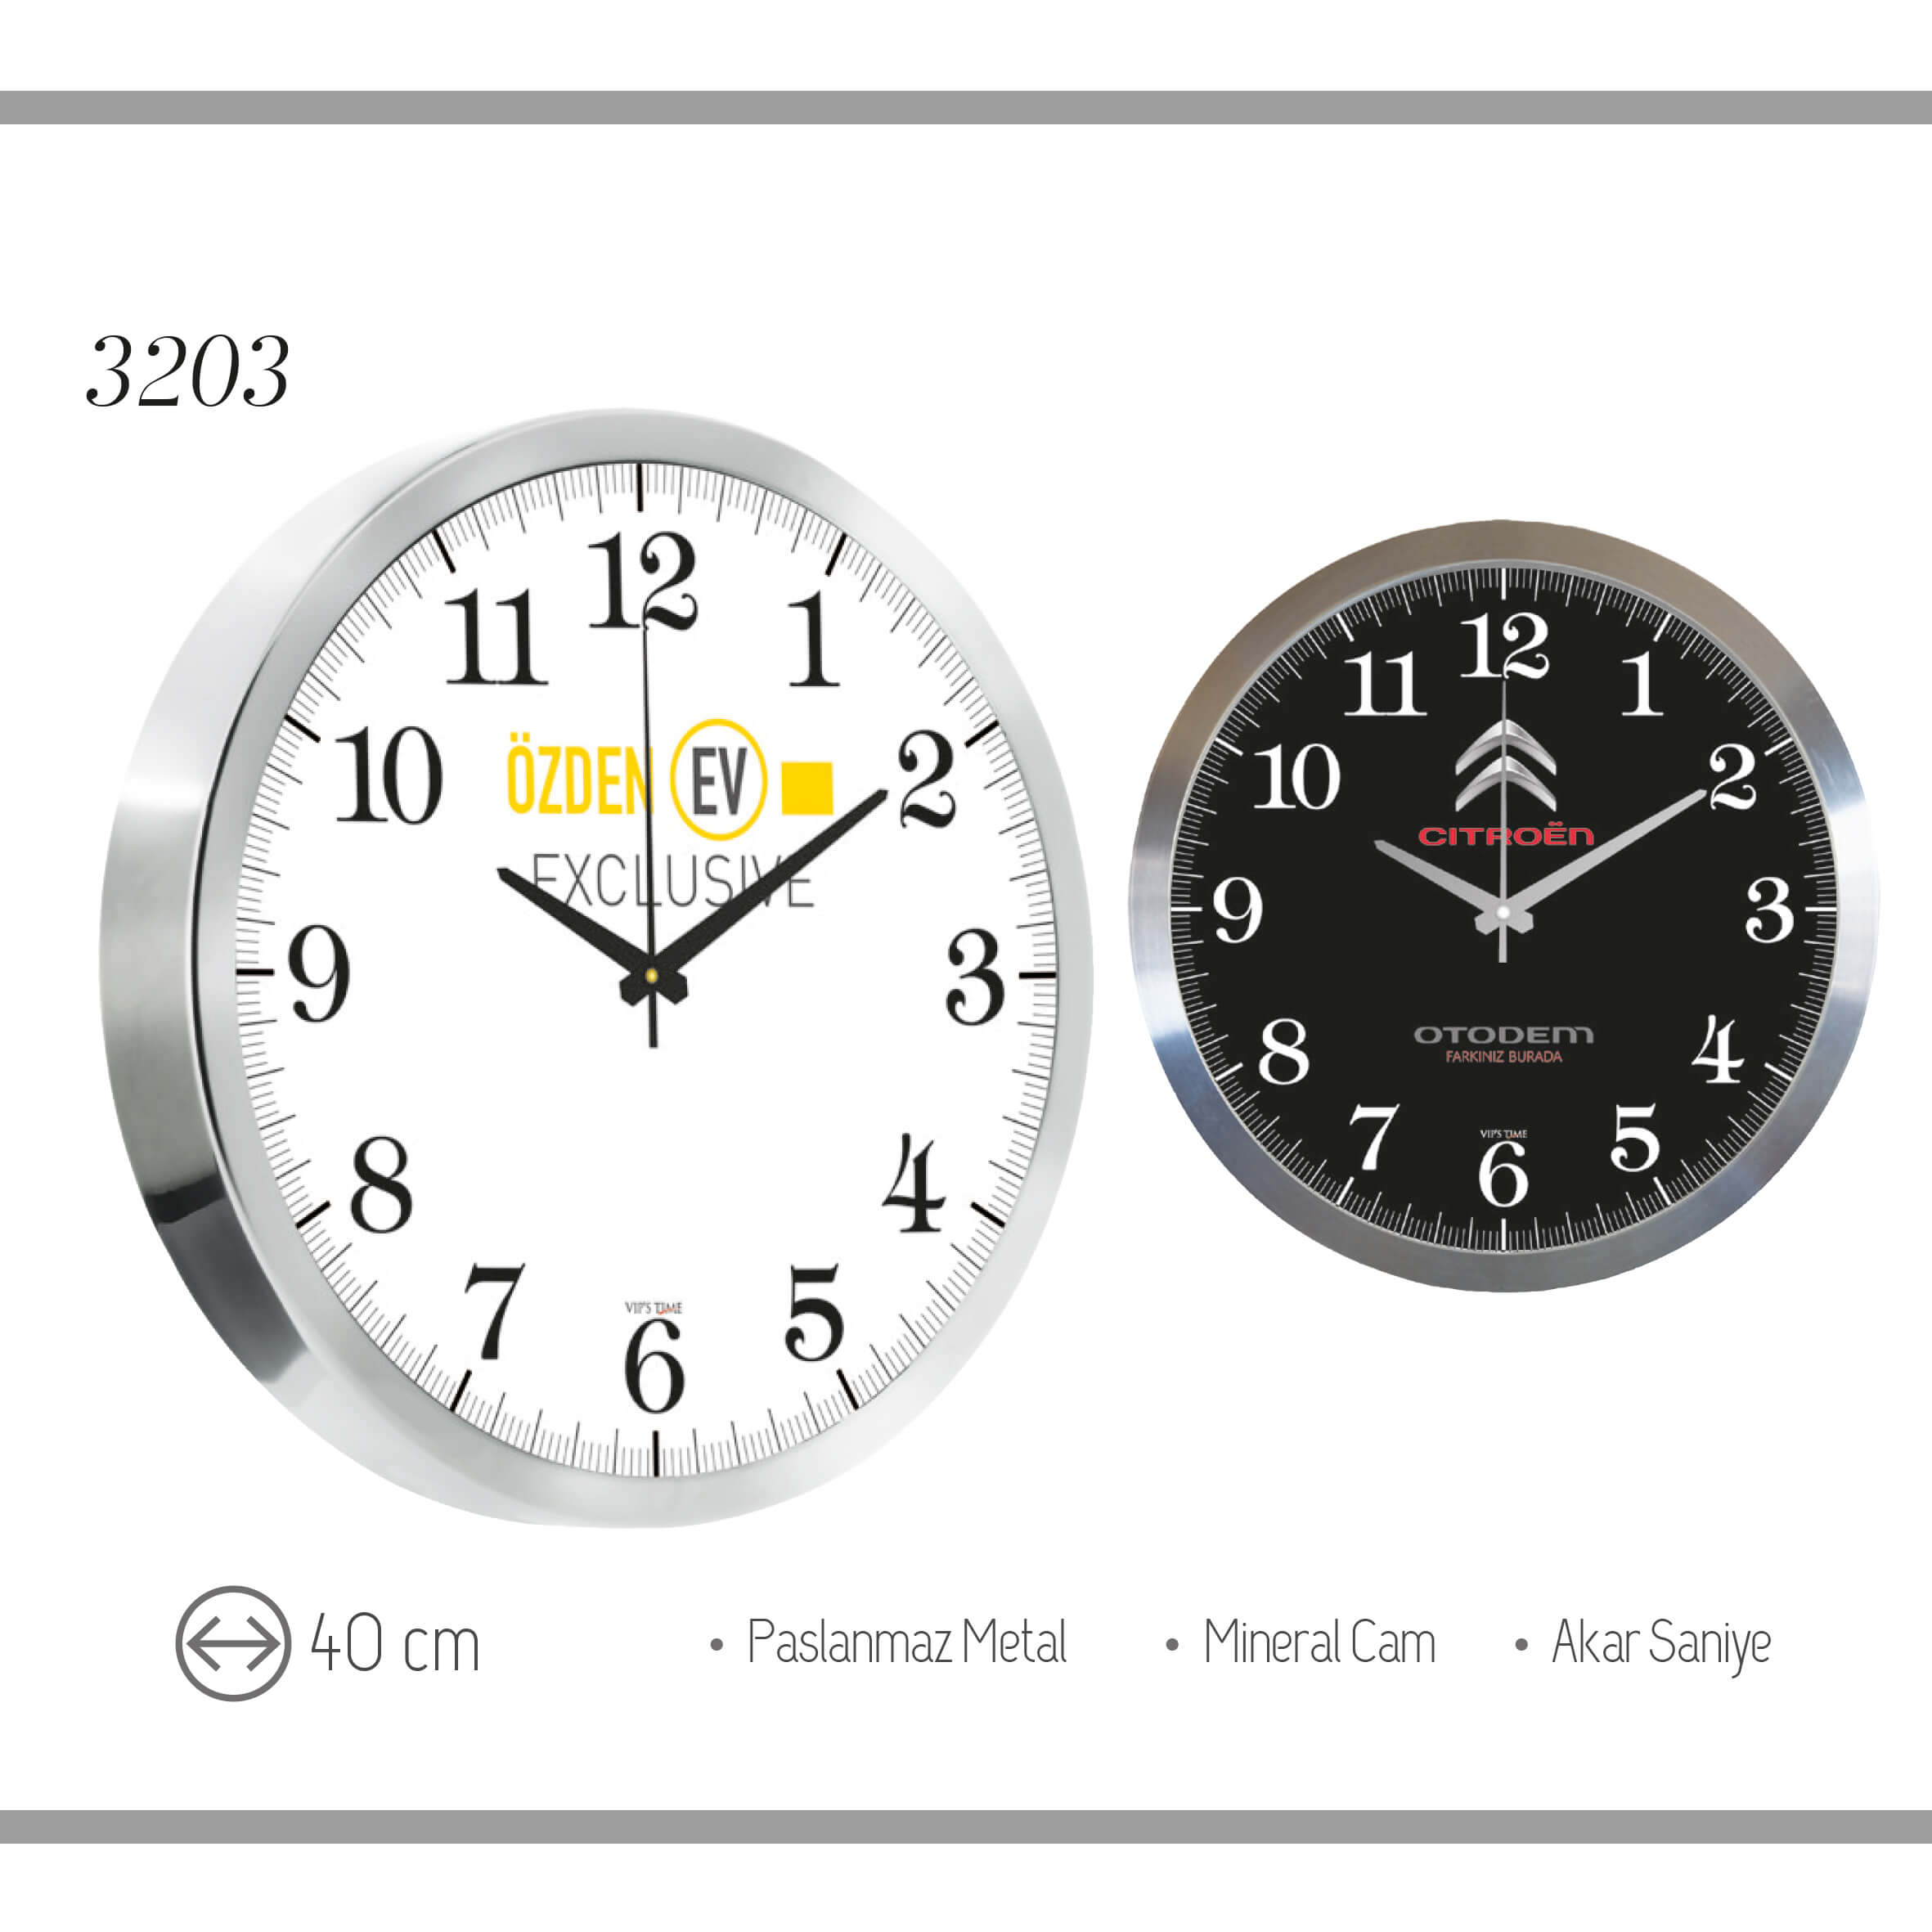 promosyon-promosyon ürünleri-promosyon saatlerduvar saatleri-promosyon duvar saati 3203